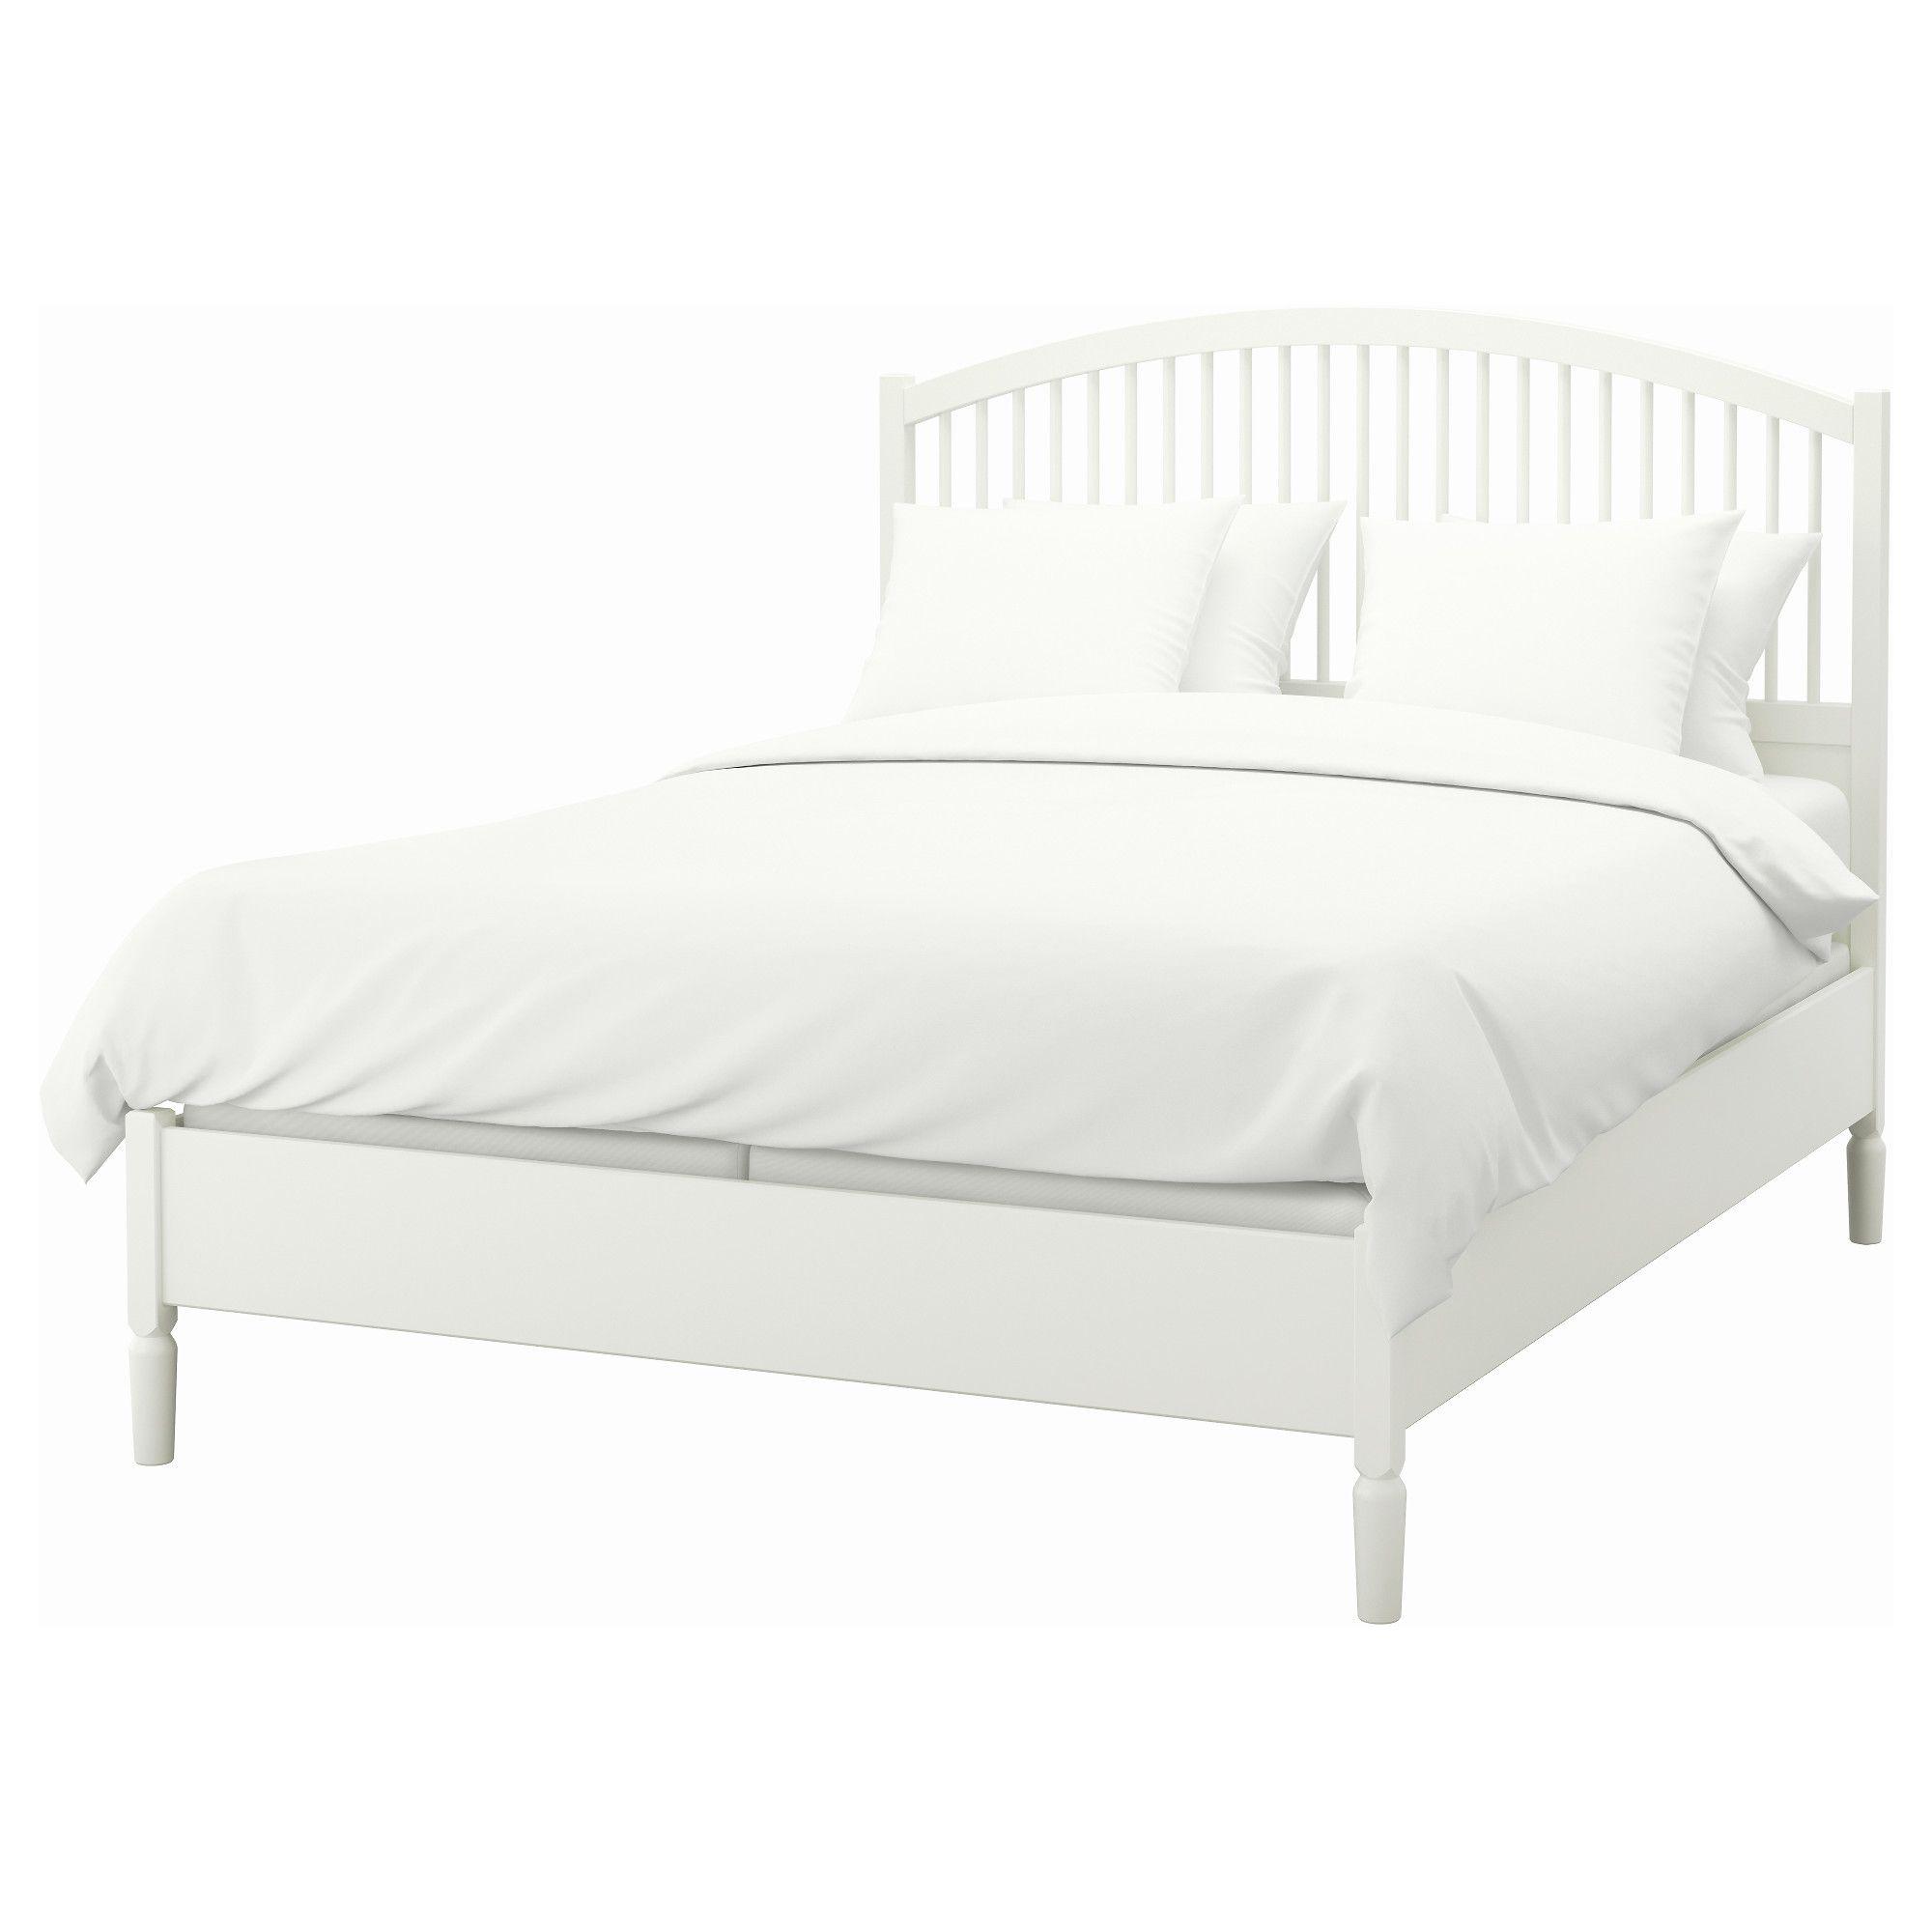 Tyssedal Bed Frame White Eidfjord Queen Bed Frame King Size Bed Frame Bed